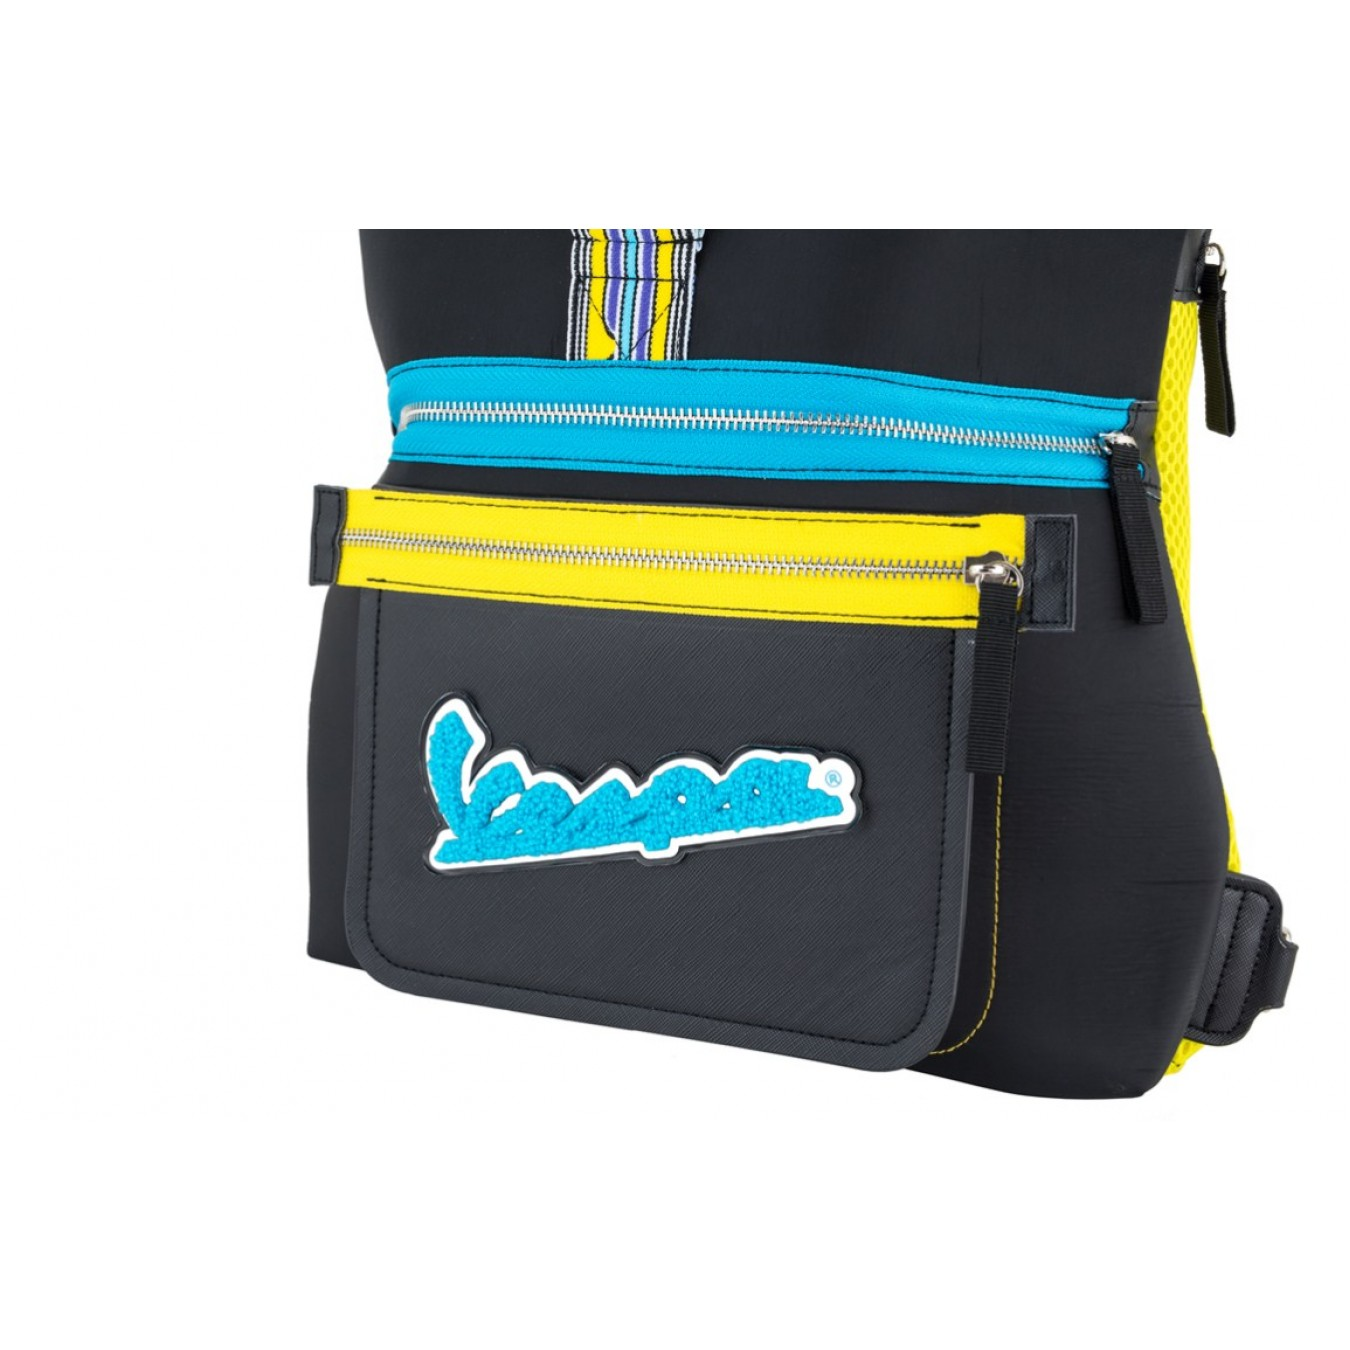 bf72518246 ... Vespa τσάντα V-Stripes κίτρινη Τσάντες   Σακίδια   Βαλίτσες